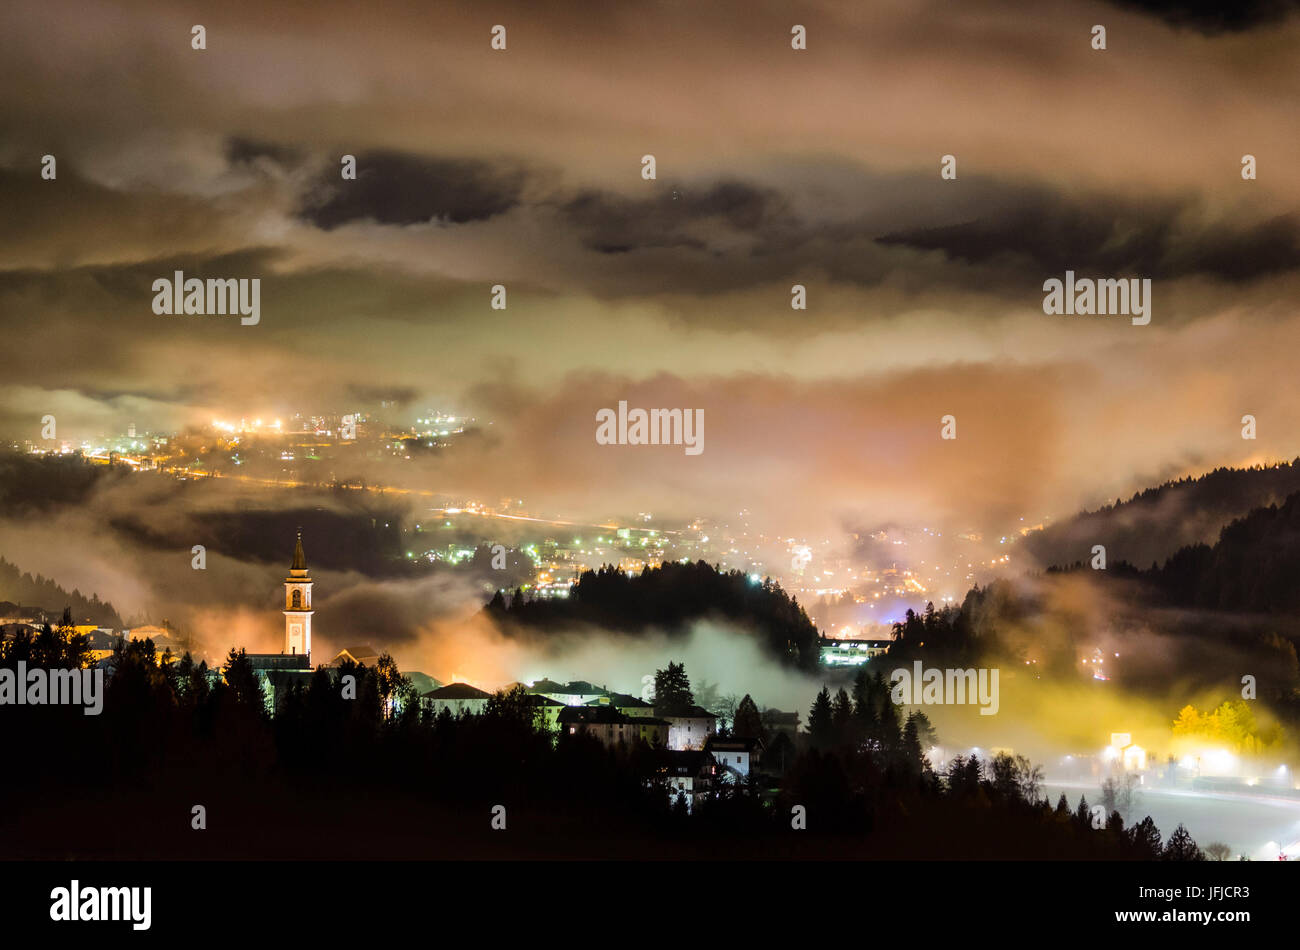 Lorenzago di Cadore, Dolomiti, Veneto, Italy, Lorenzago wrapped in the mist of the night - Stock Image